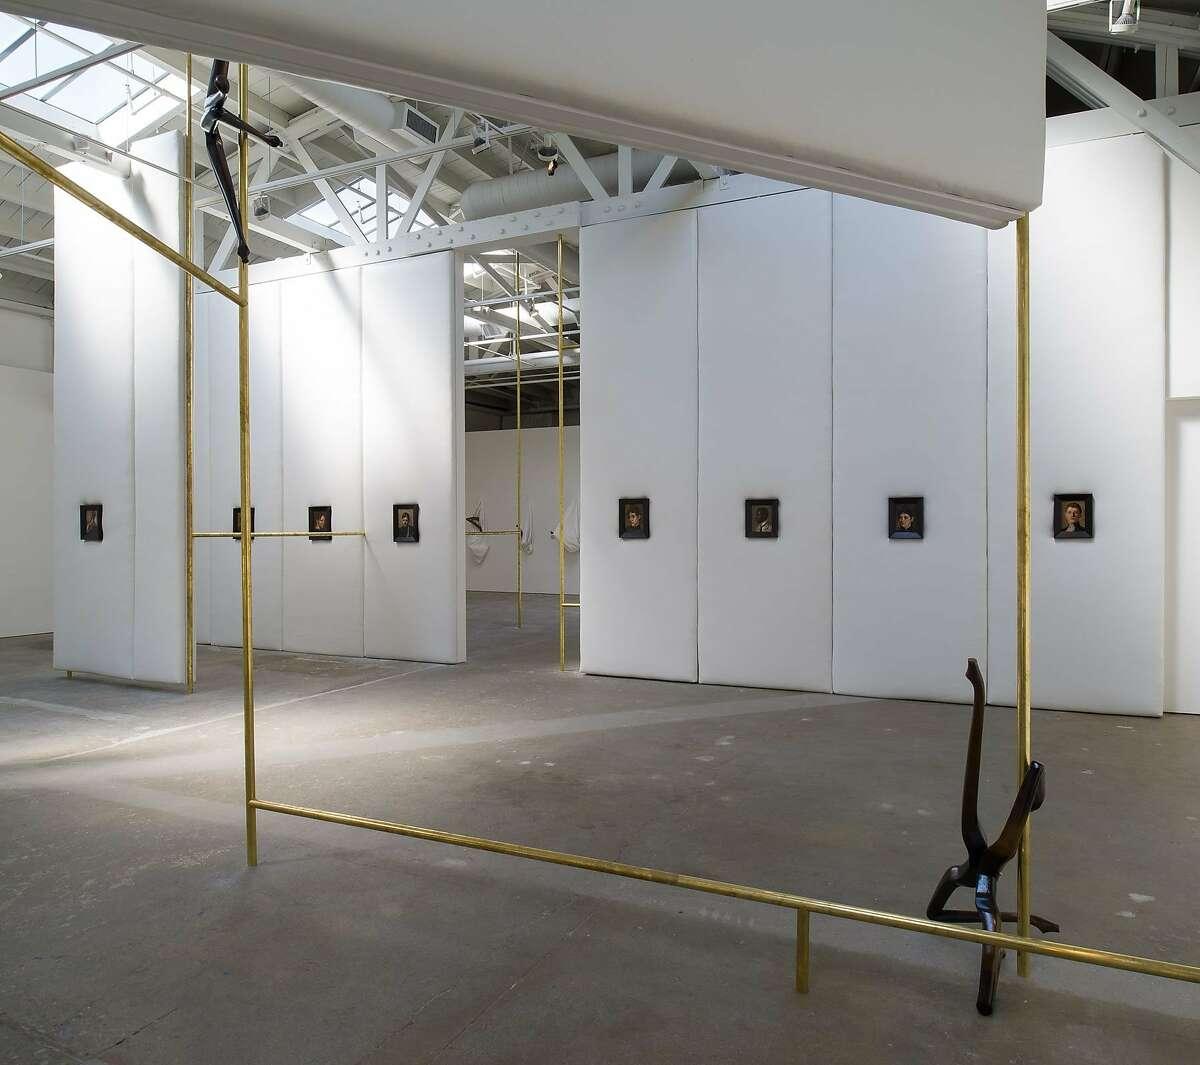 Markus Schinwald's work is on view at the CCA Wattis Institute.